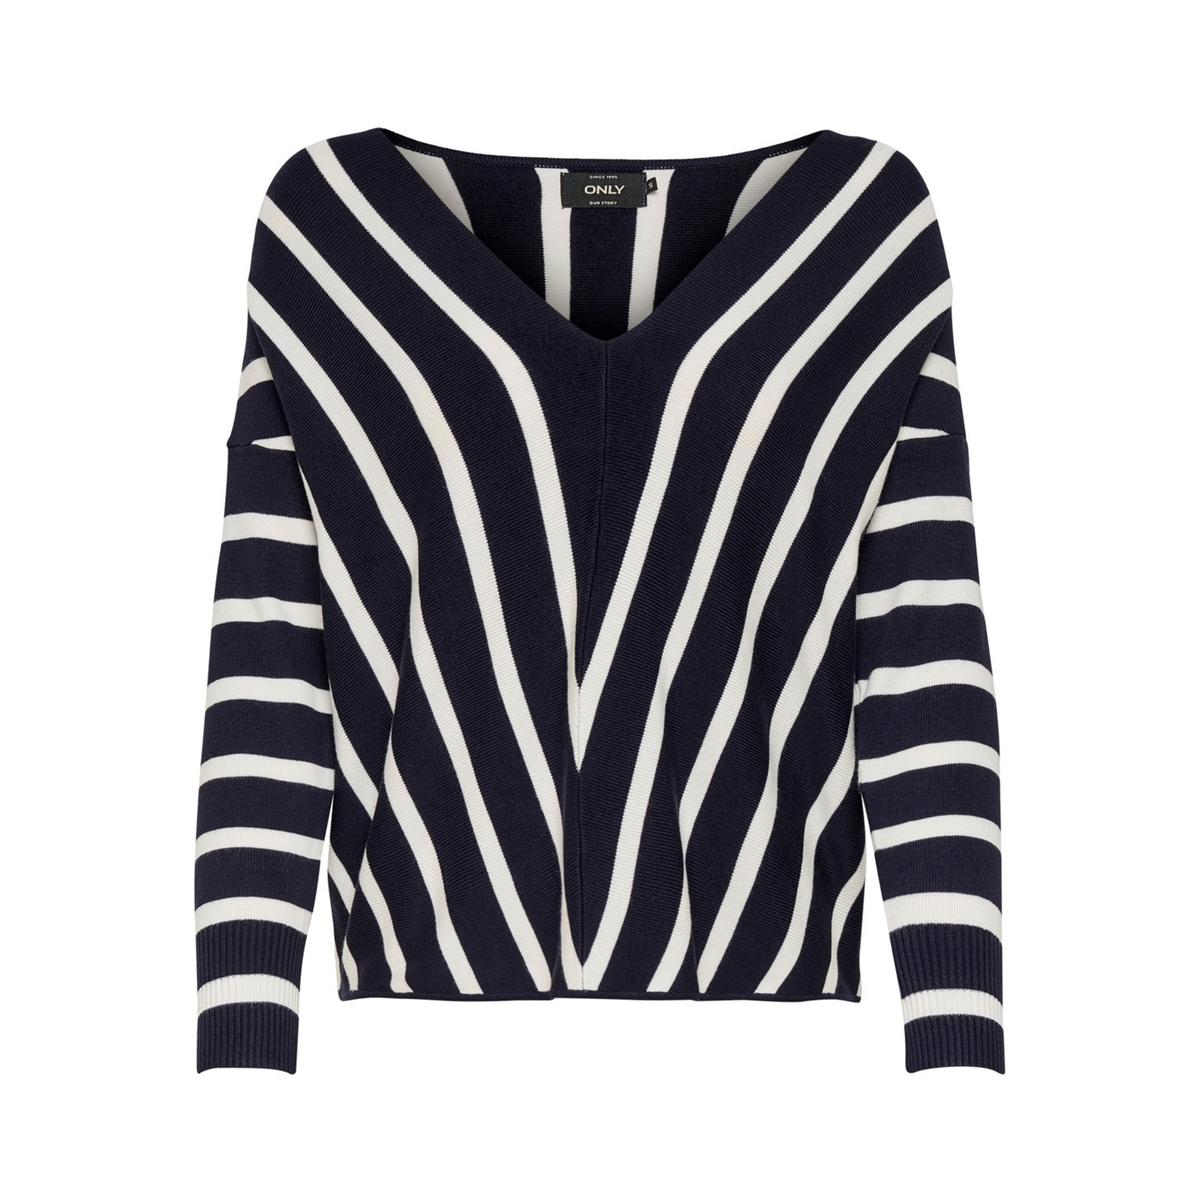 Пуловер La Redoute С вырезом-лодочкой из тонкого трикотажа L синий